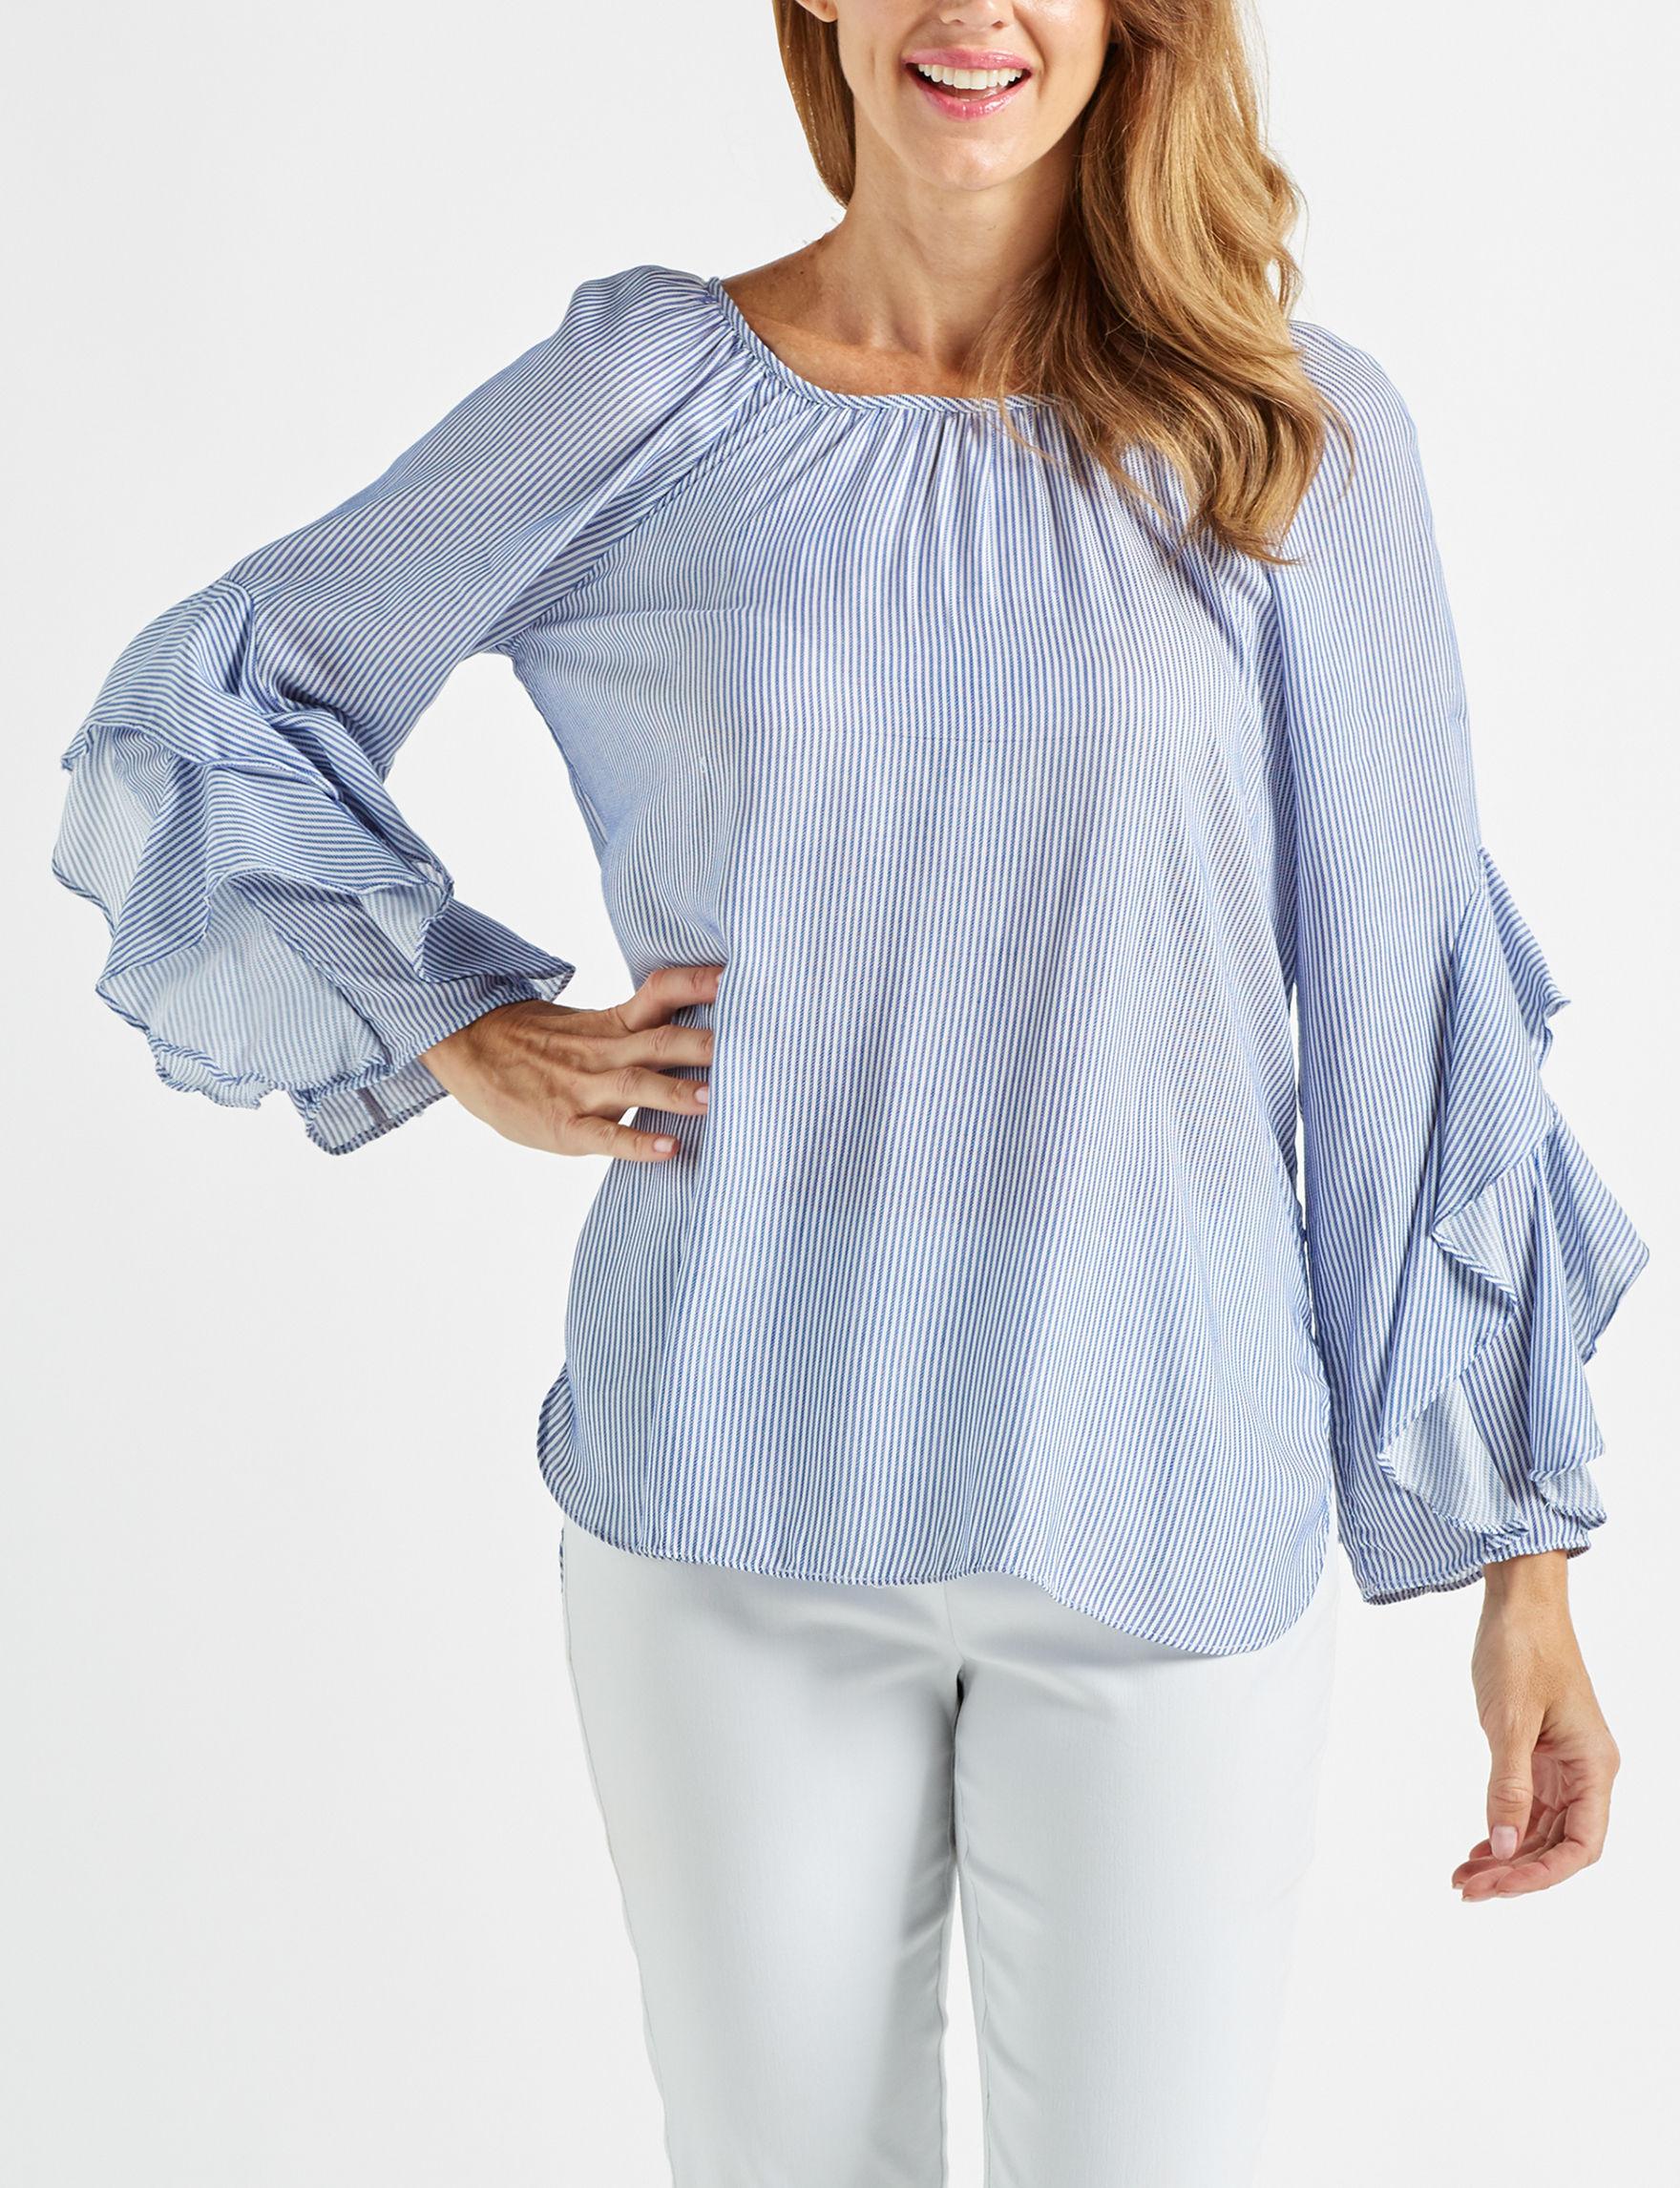 Blush Collection White Stripe Shirts & Blouses